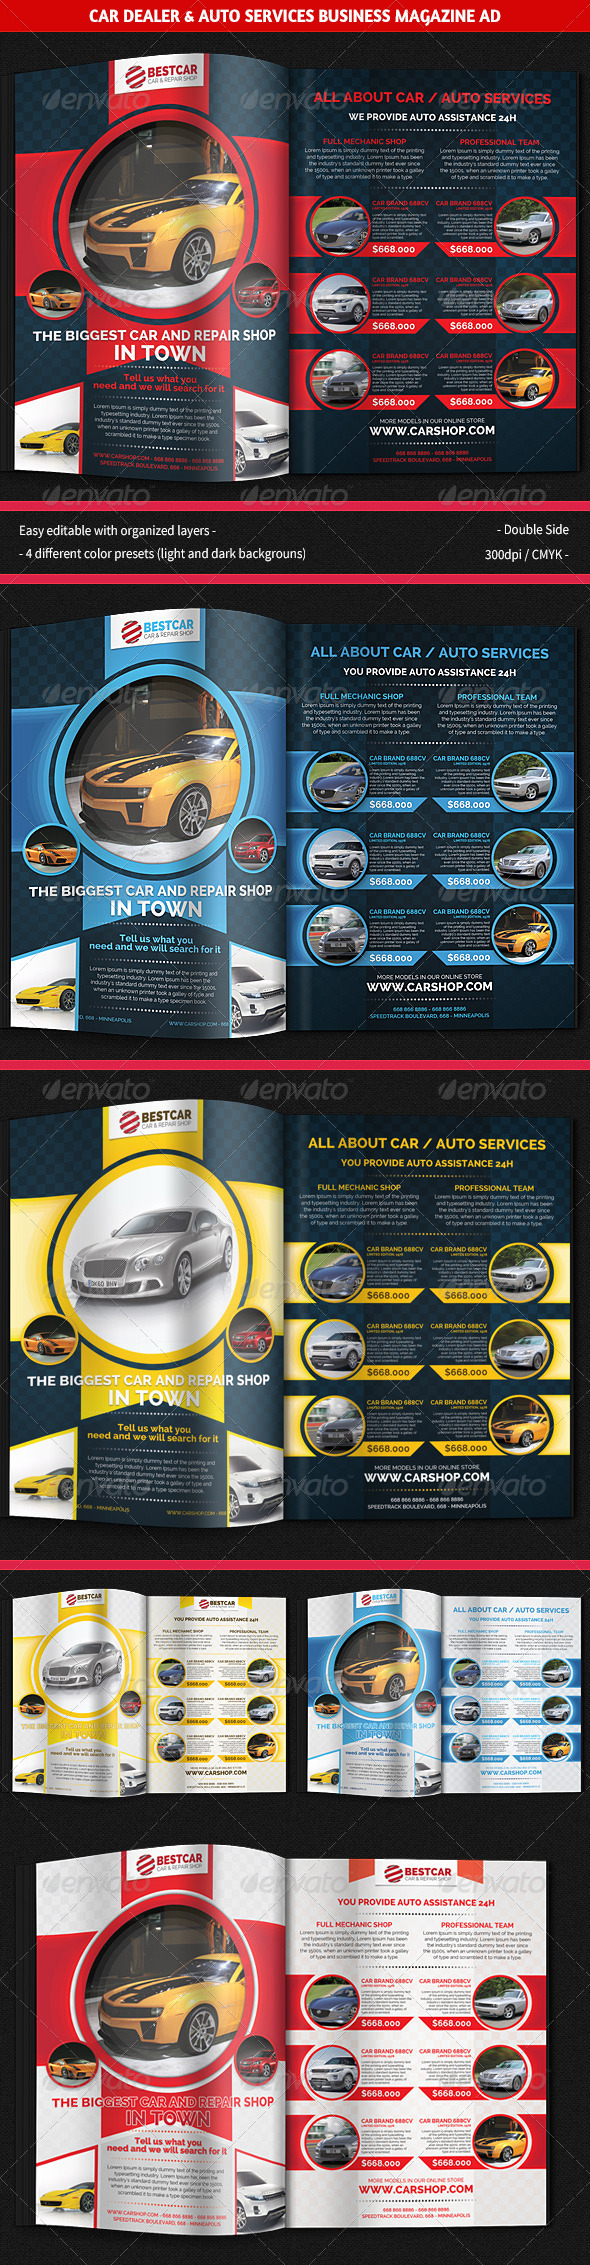 GraphicRiver Car Dealer & Auto Services Business Magazine Ad 5867261